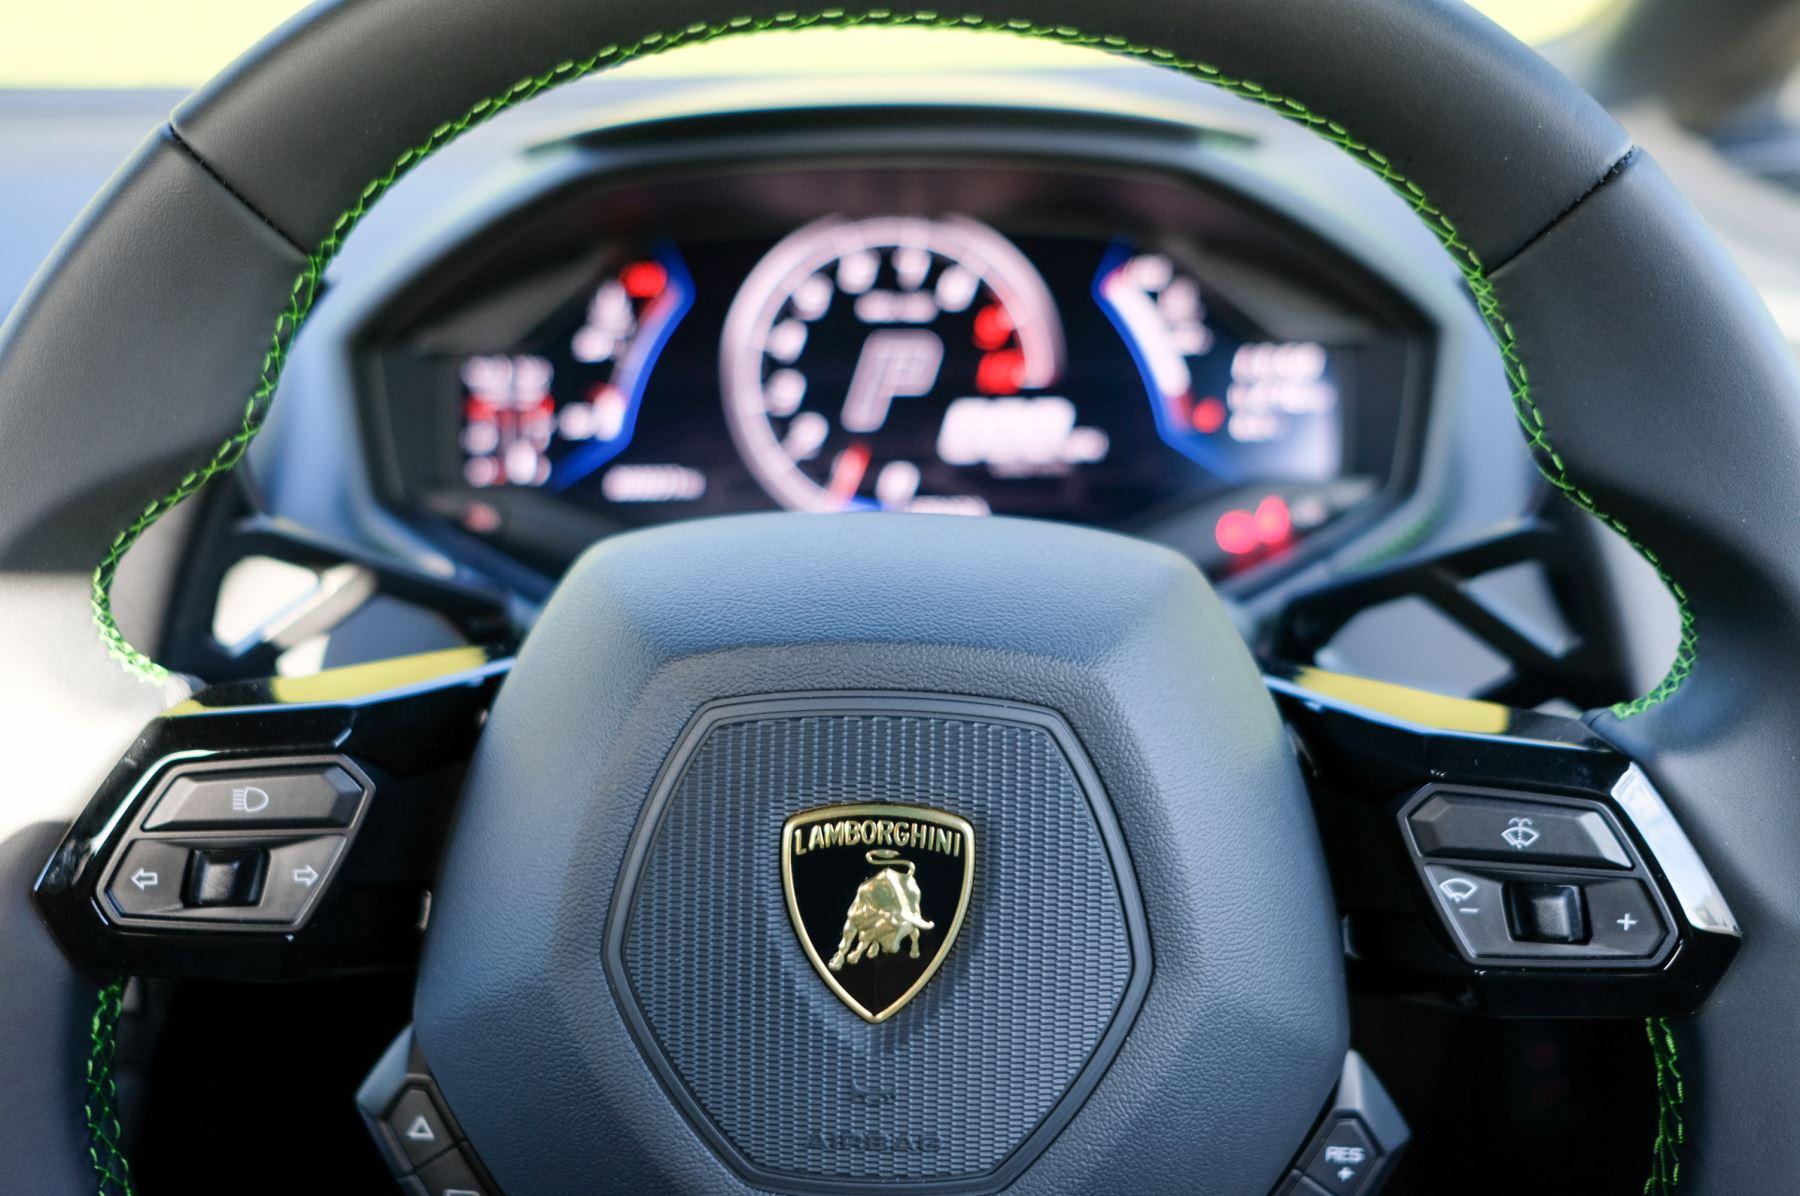 Lamborghini Huracan EVO Spyder 5.2 V10 610 2dr Auto image 14